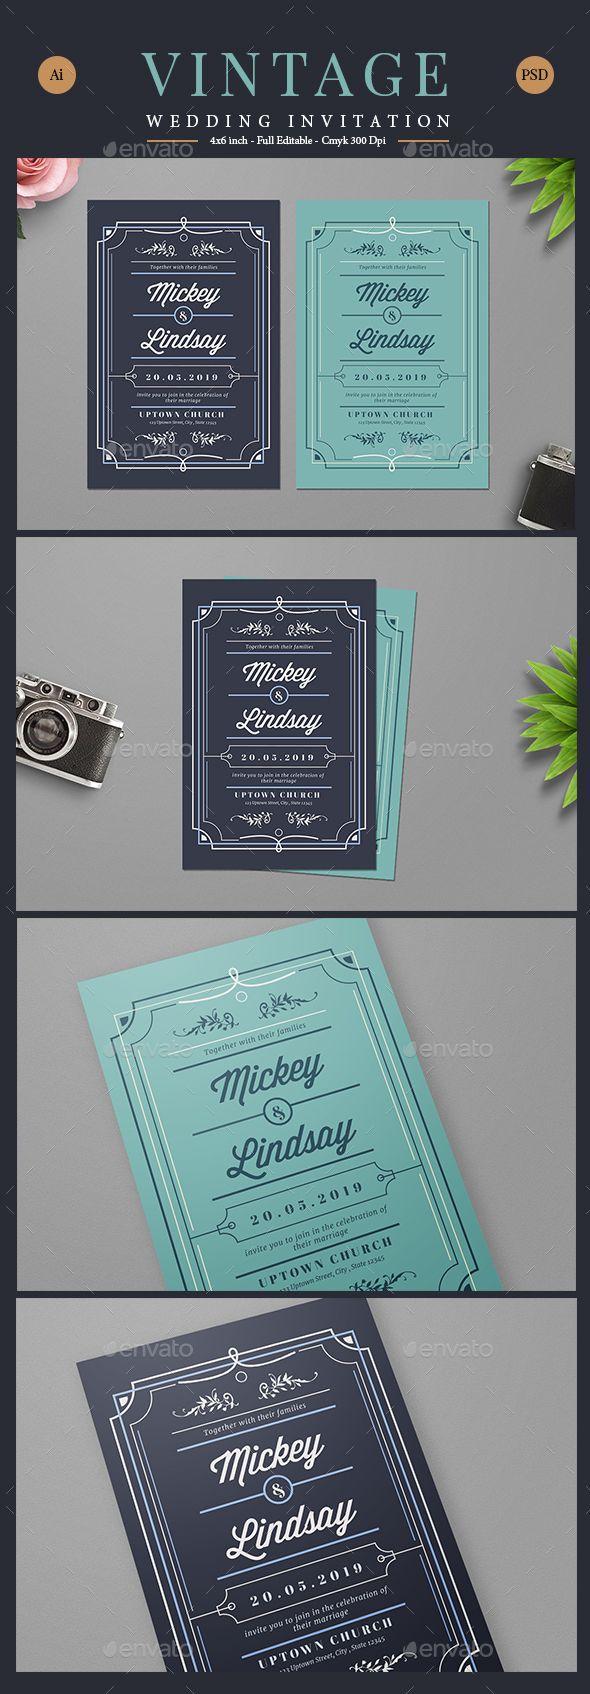 Best Wedding Invitation Templates Images On Pinterest Invites - Wedding invitation templates: wedding invitation template illustrator